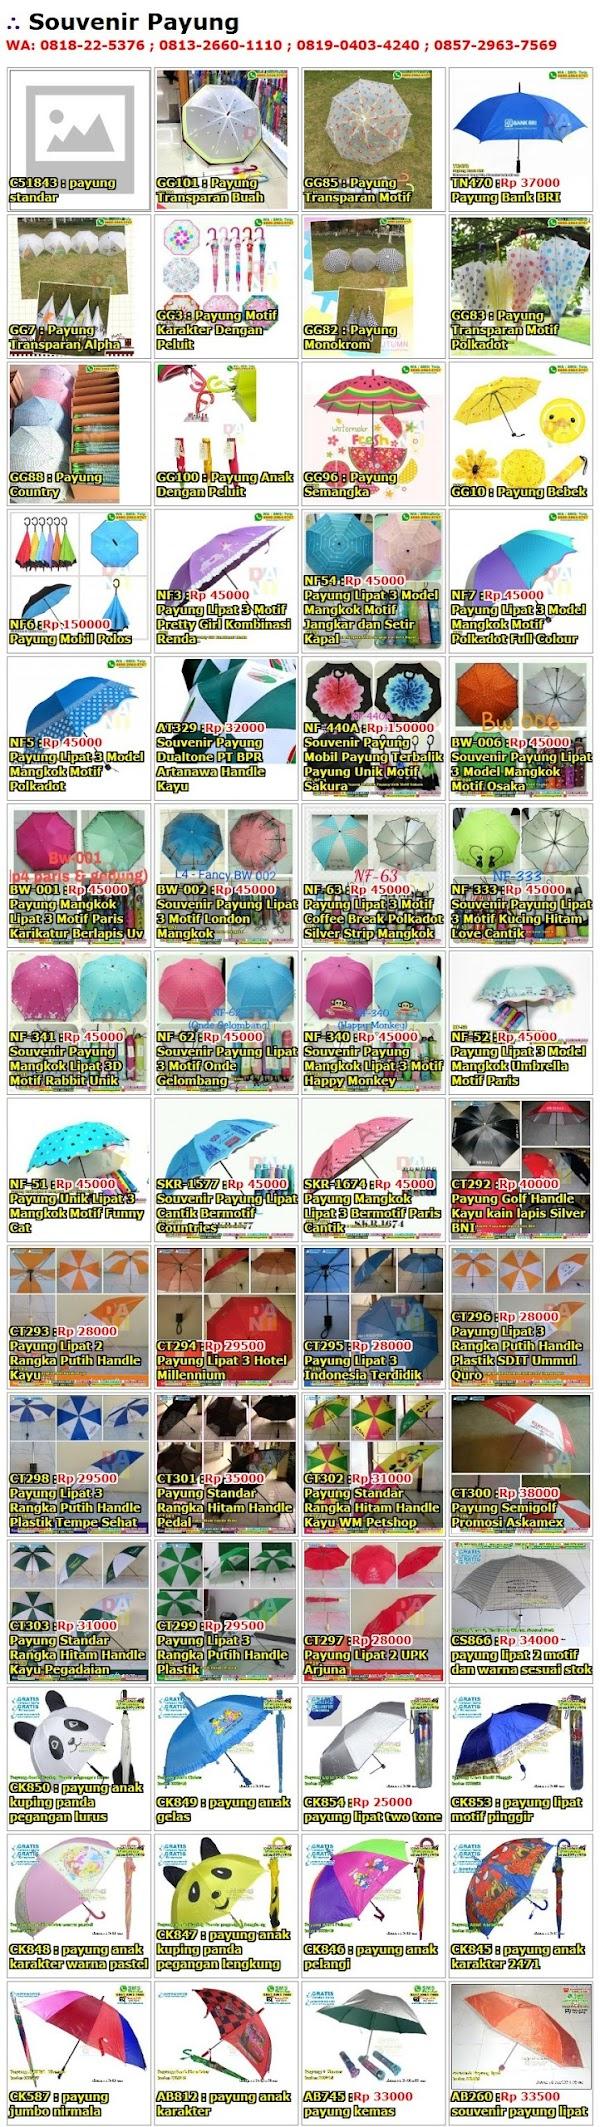 Daftar Harga Souvenir Payung